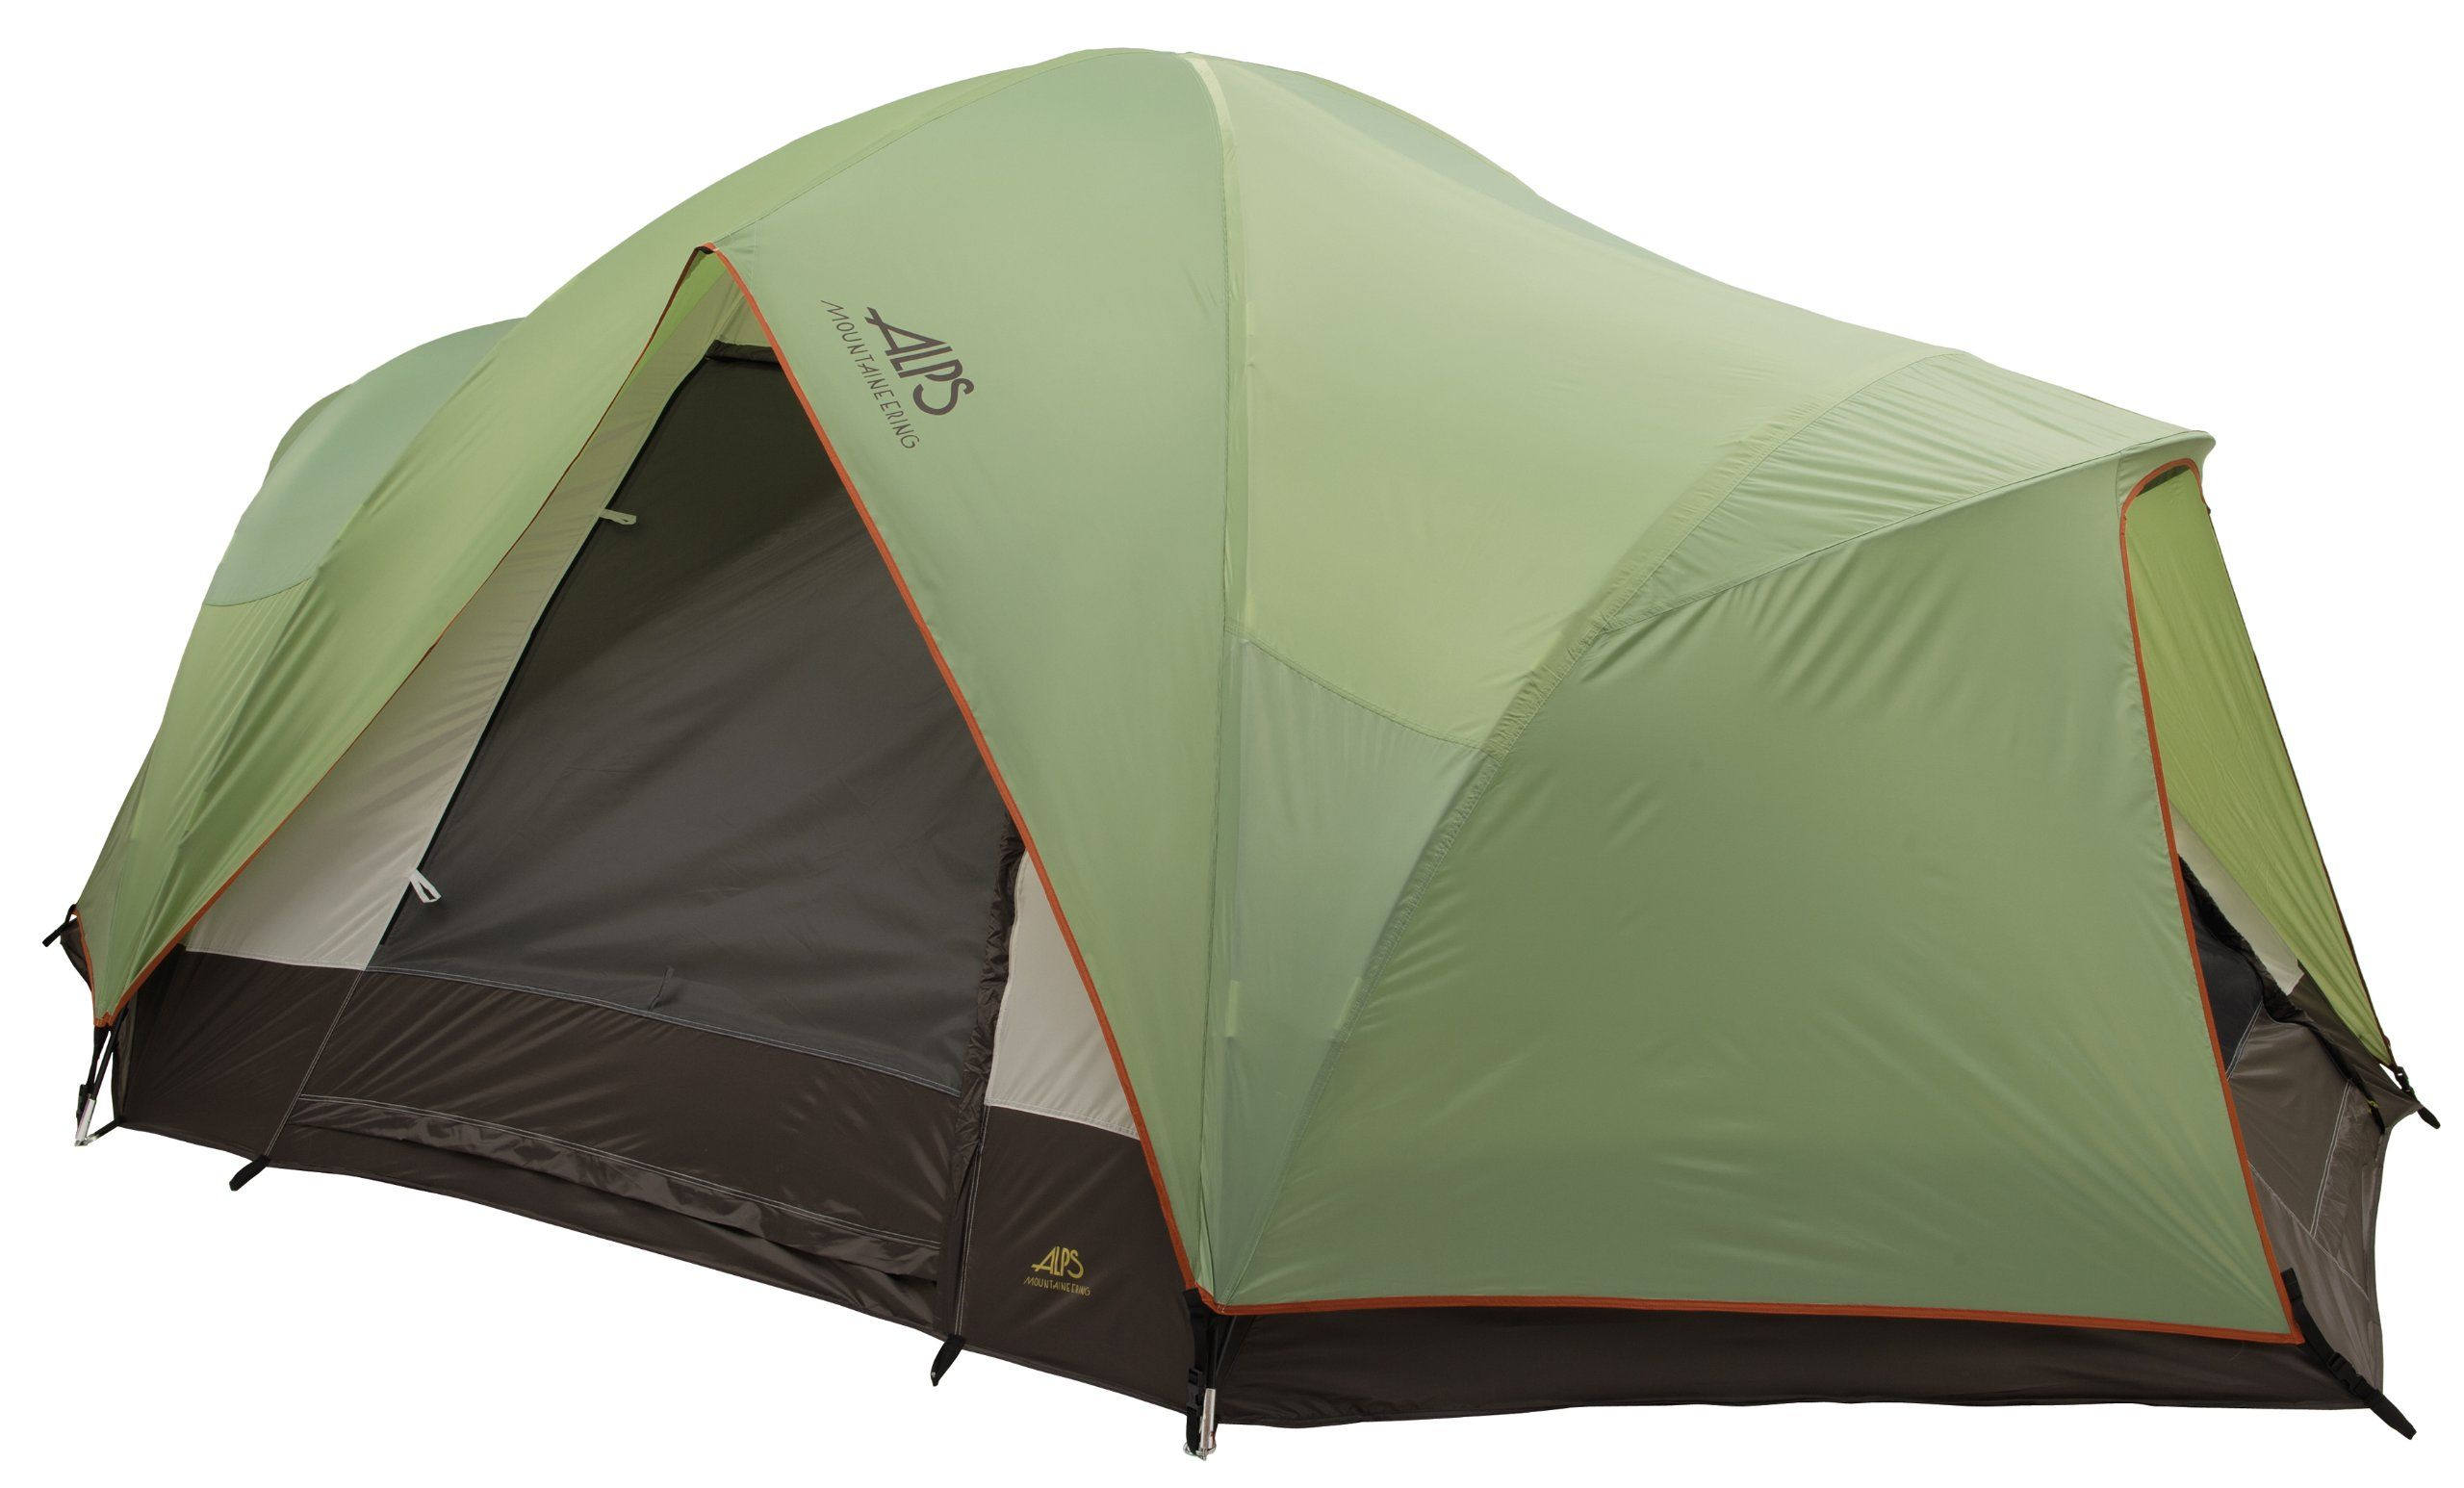 Amazon.com  ALPS Mountaineering Three Room C&ing Tent (10 x 16-Feet · MountaineeringBrowningAlpsTents  sc 1 st  Pinterest & Amazon.com : ALPS Mountaineering Three Room Camping Tent (10 x 16 ...